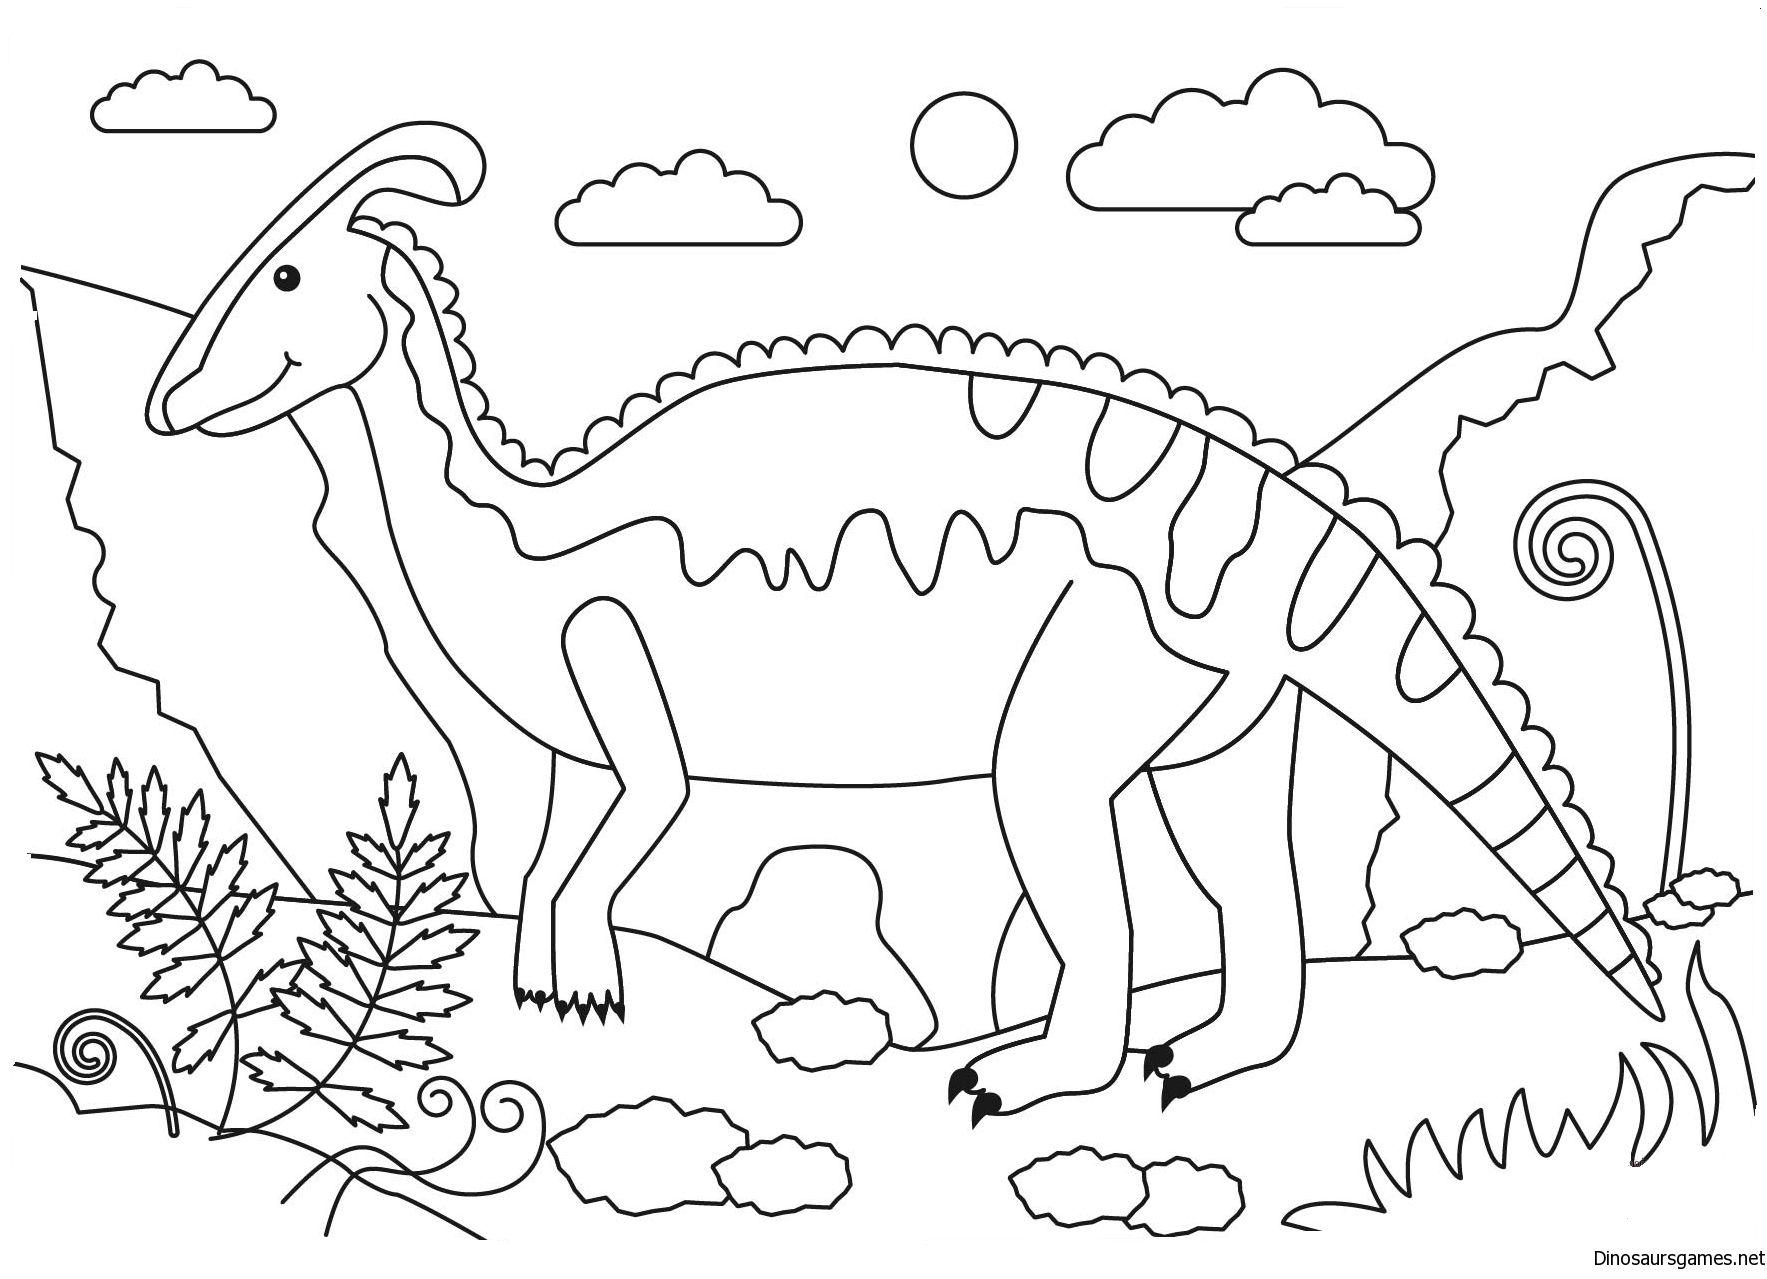 Enjoy Parasaurolophus Dinosaur Coloring Page At Dinosaursgames Net